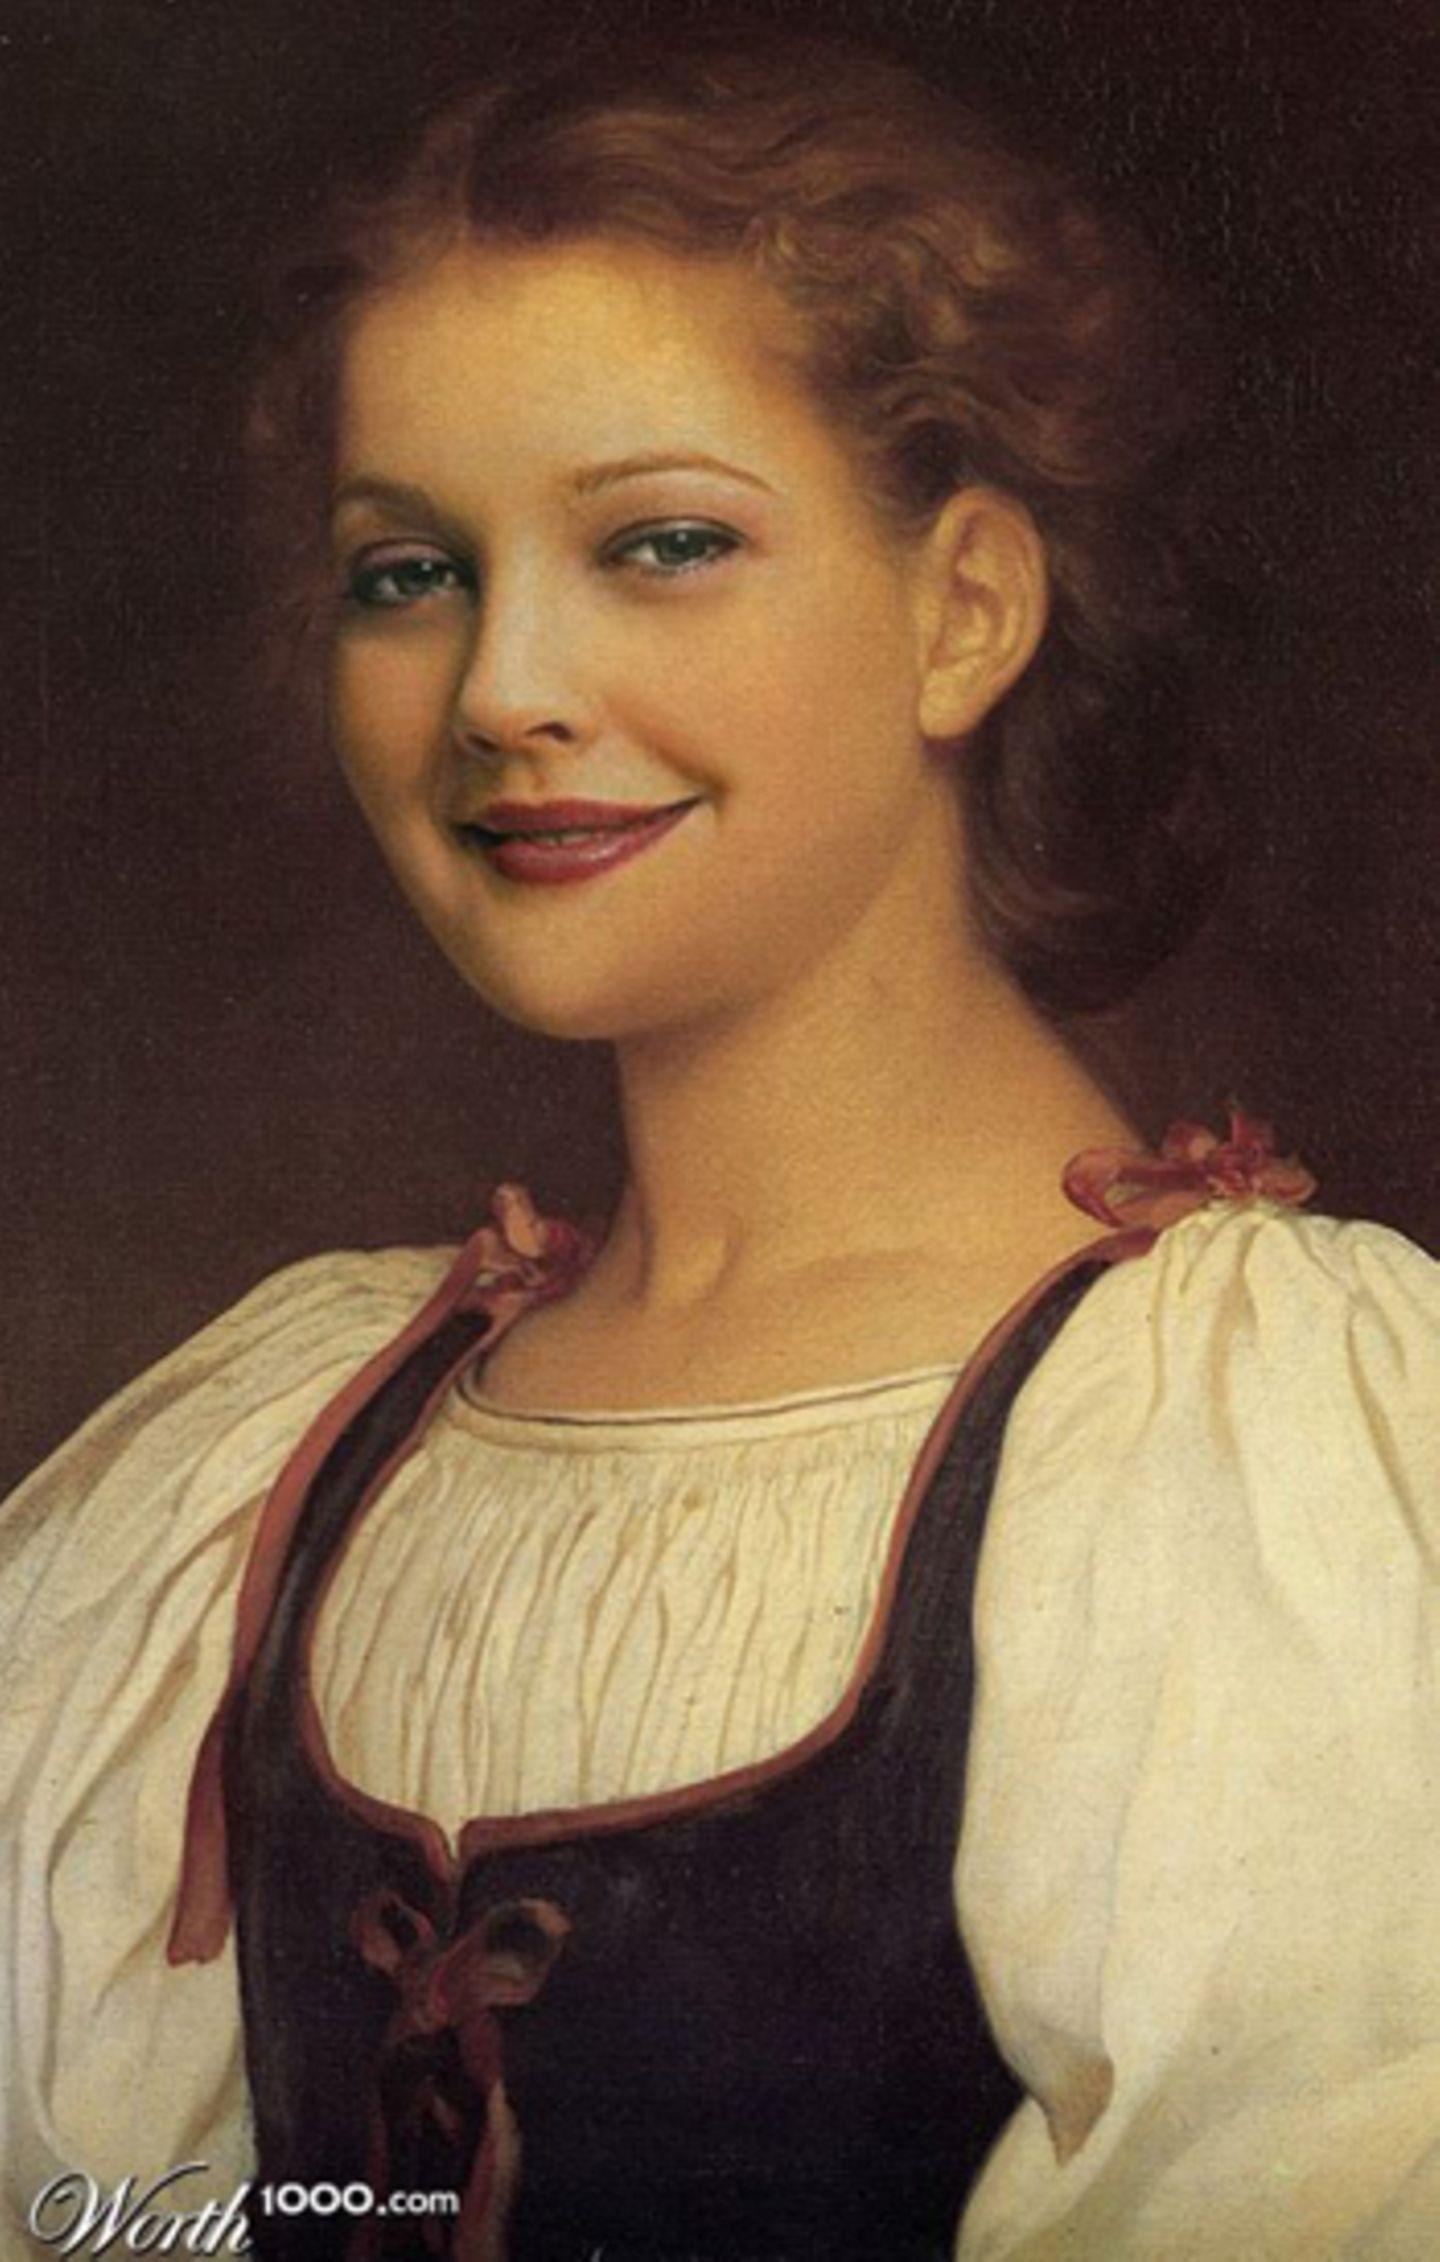 Drew Barrymore als Ölgemälde.